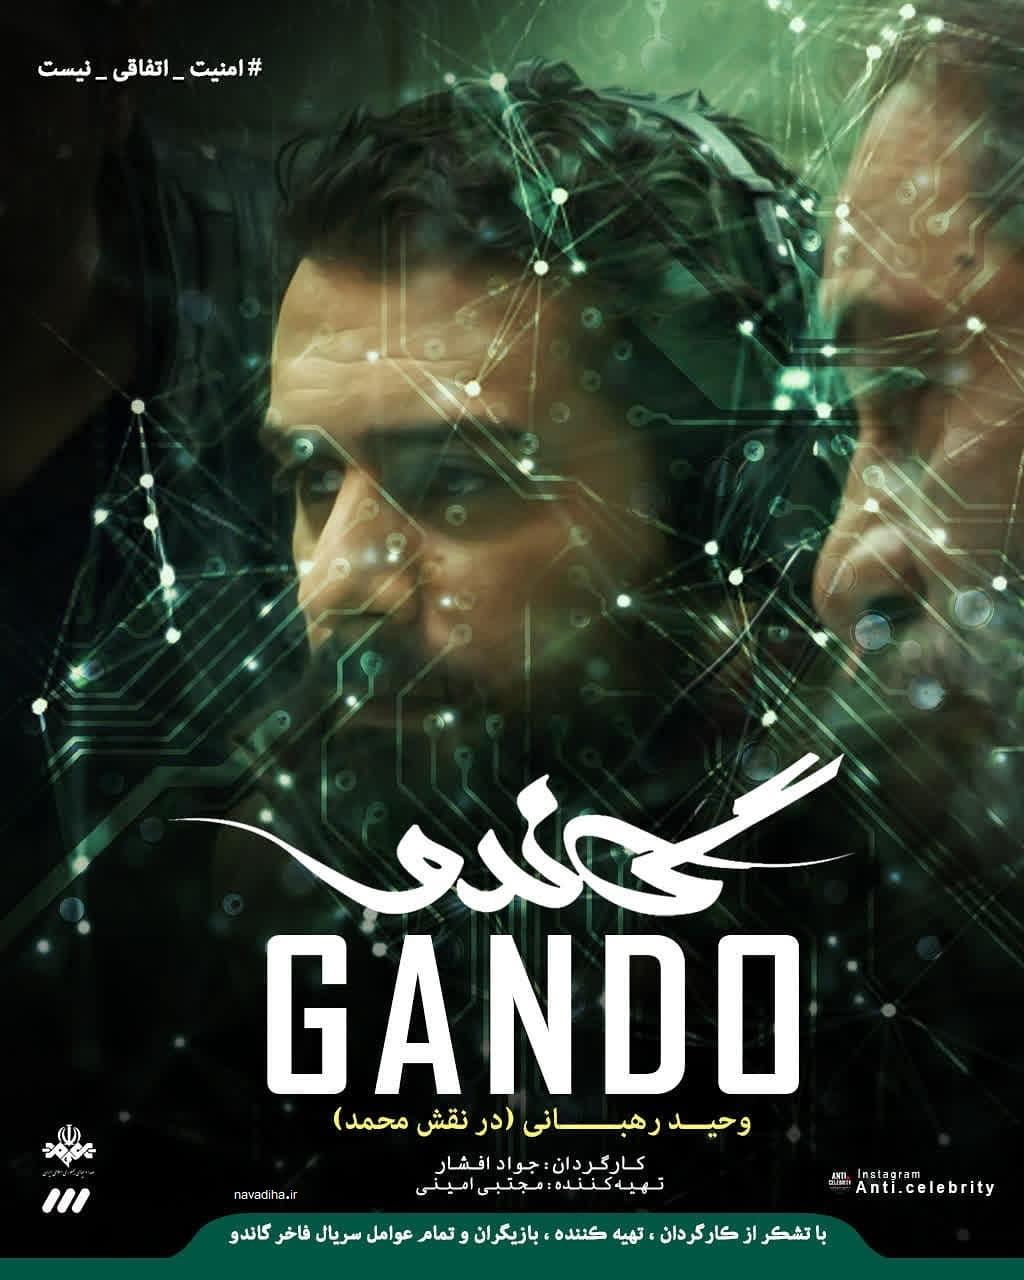 سریال زیبا و پر مخاطب گاندو